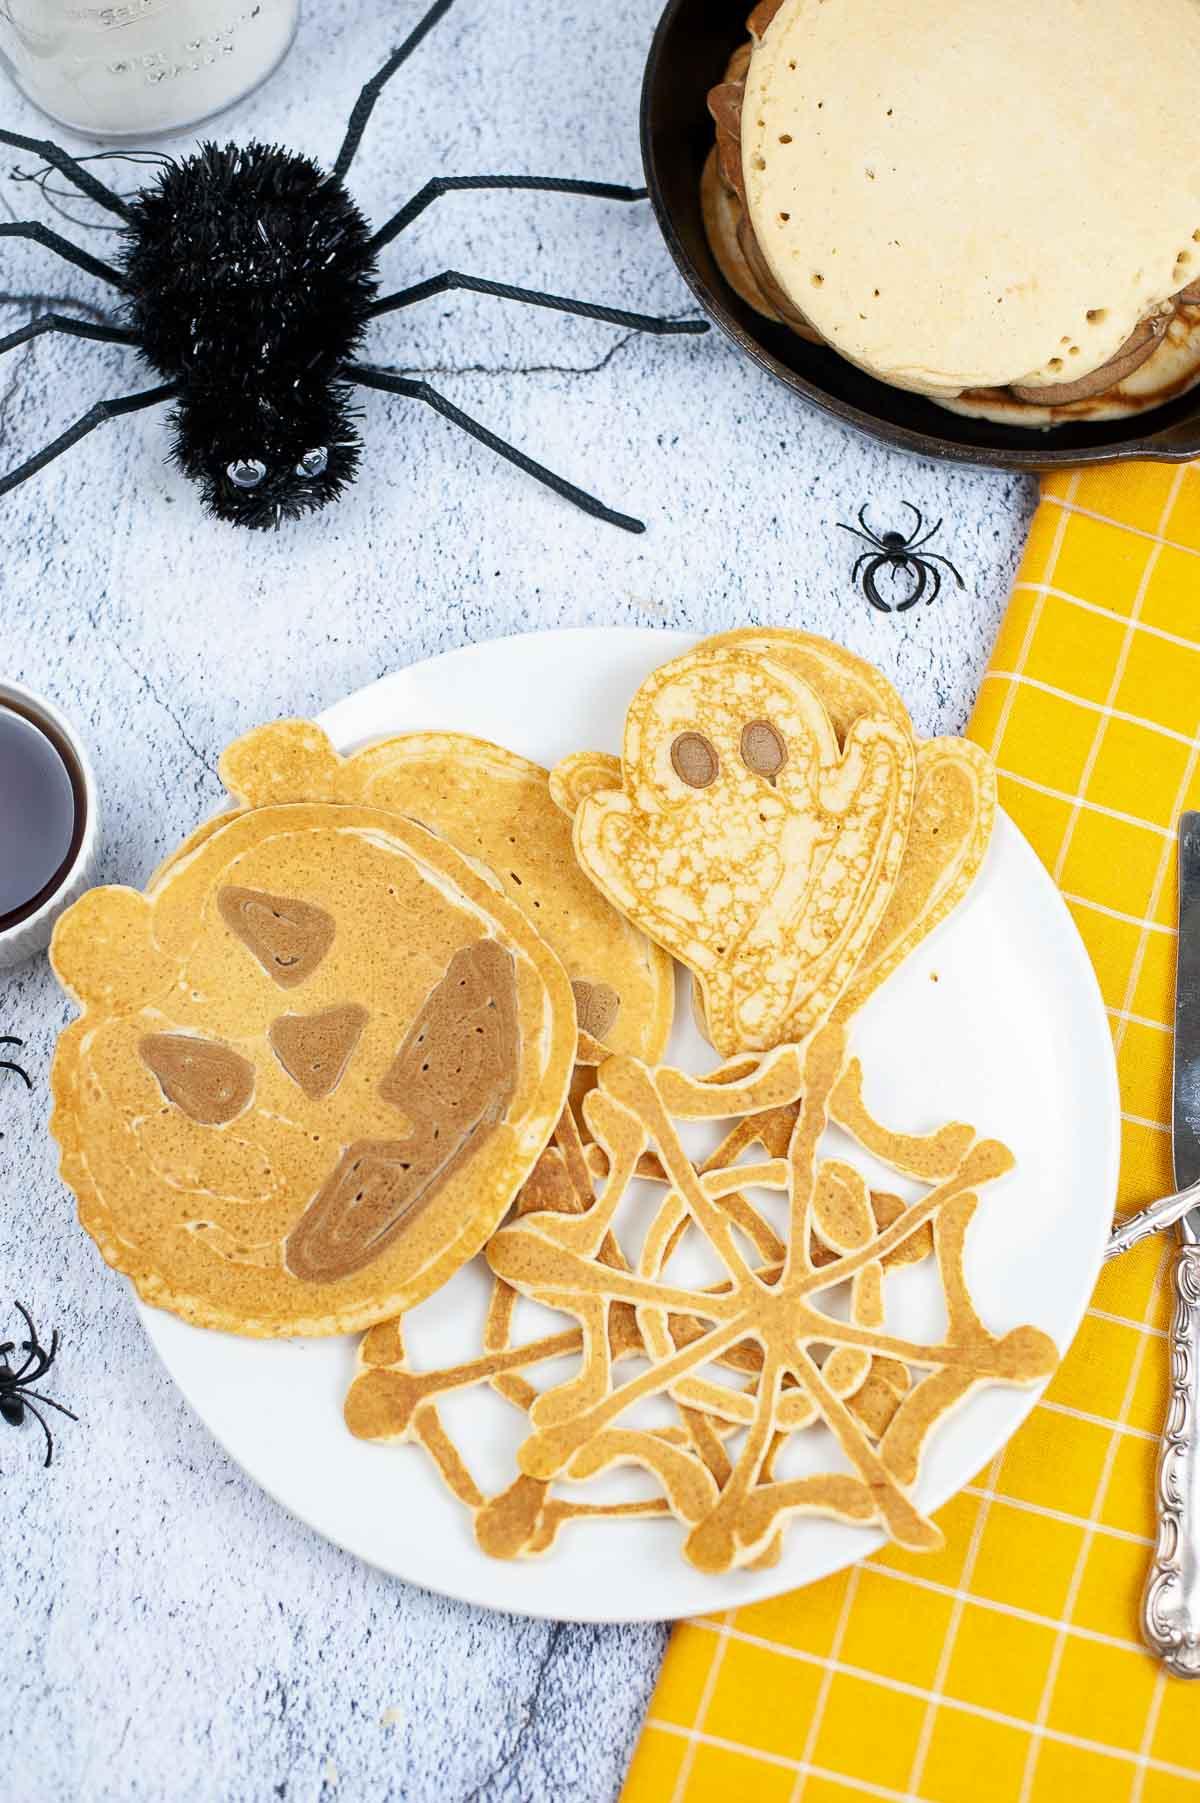 Halloween breakfast plate with Halloween shaped pancakes.